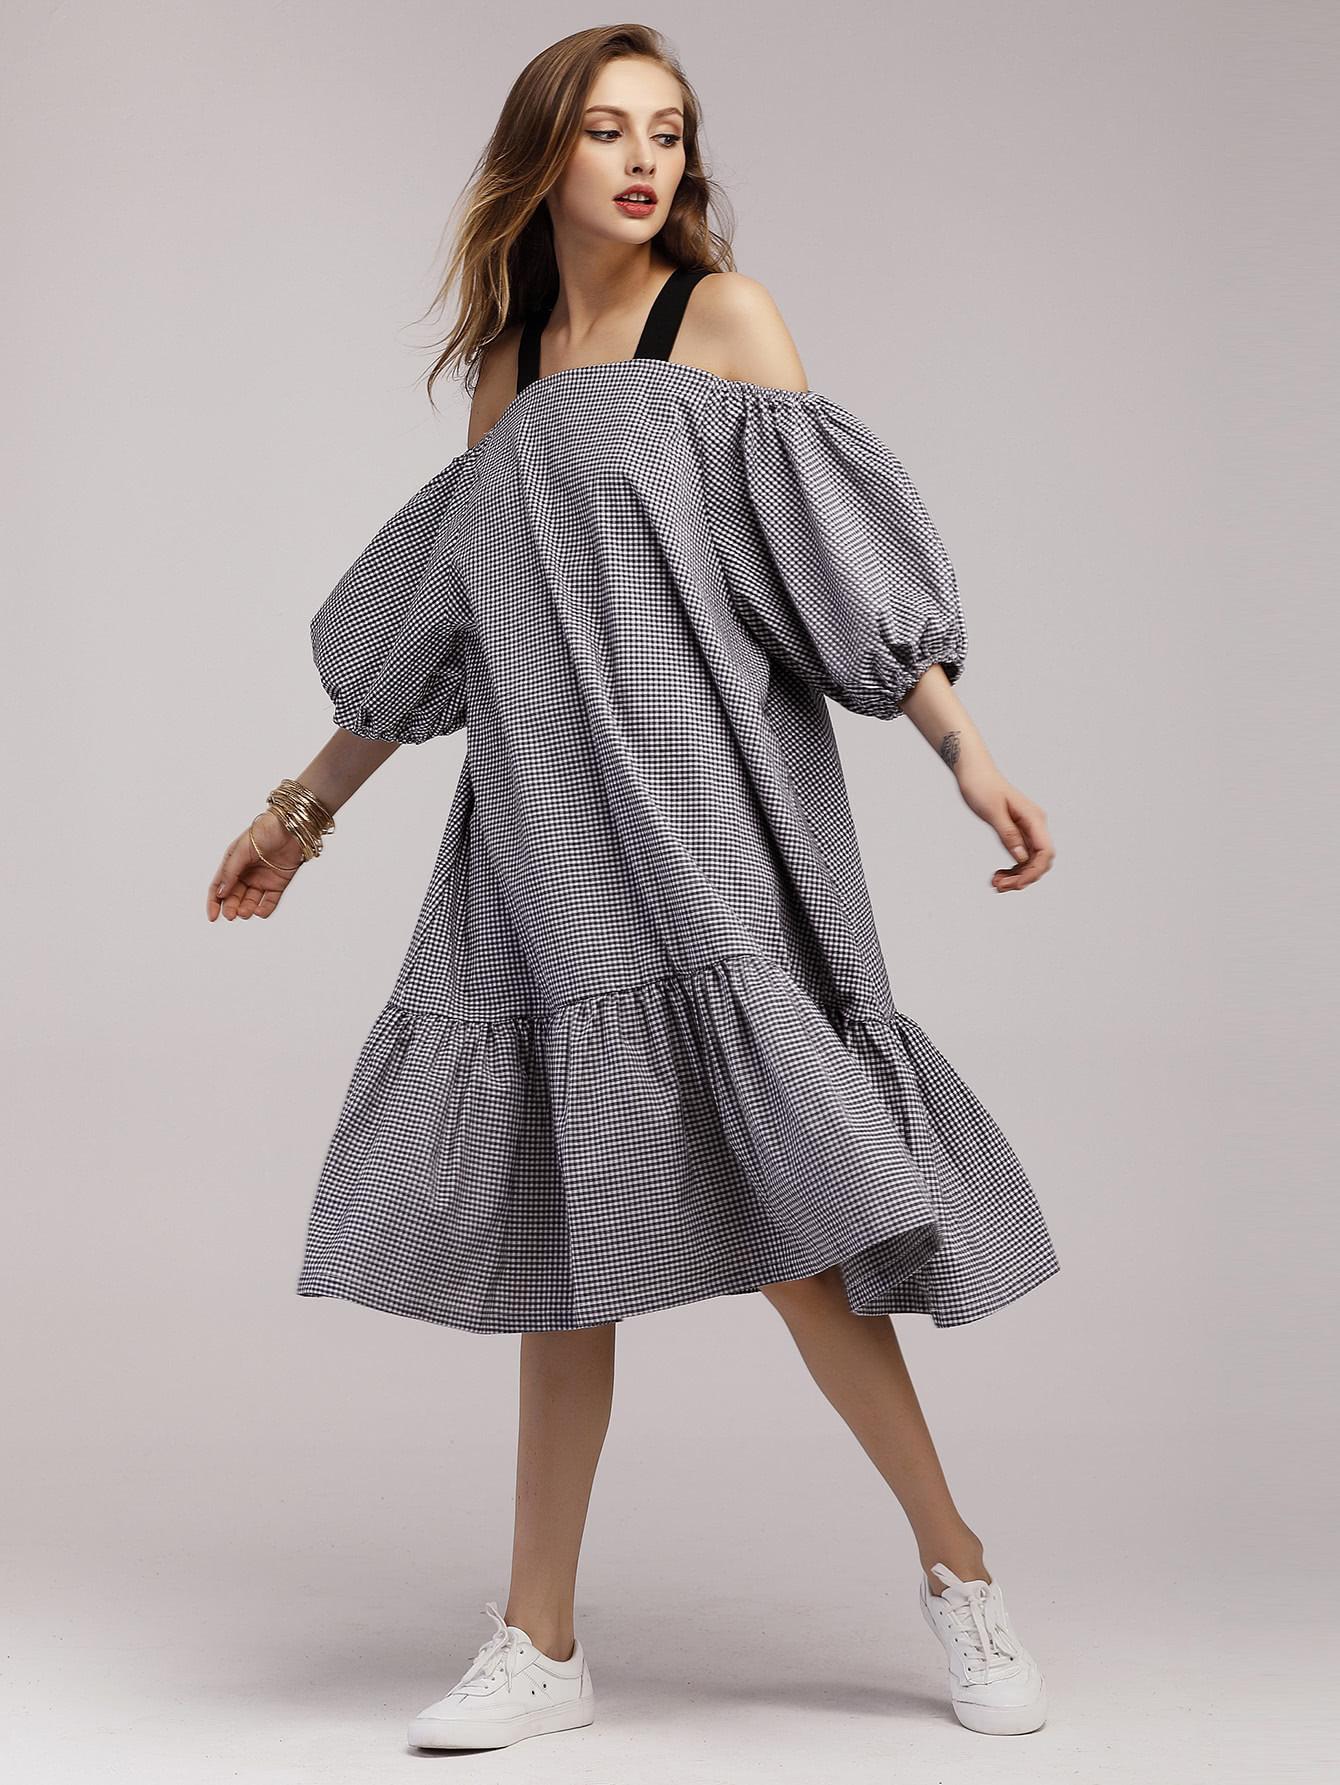 Gingham Lantern Sleeve Frill Hem Dress gathered sleeve curved dip hem gingham dress